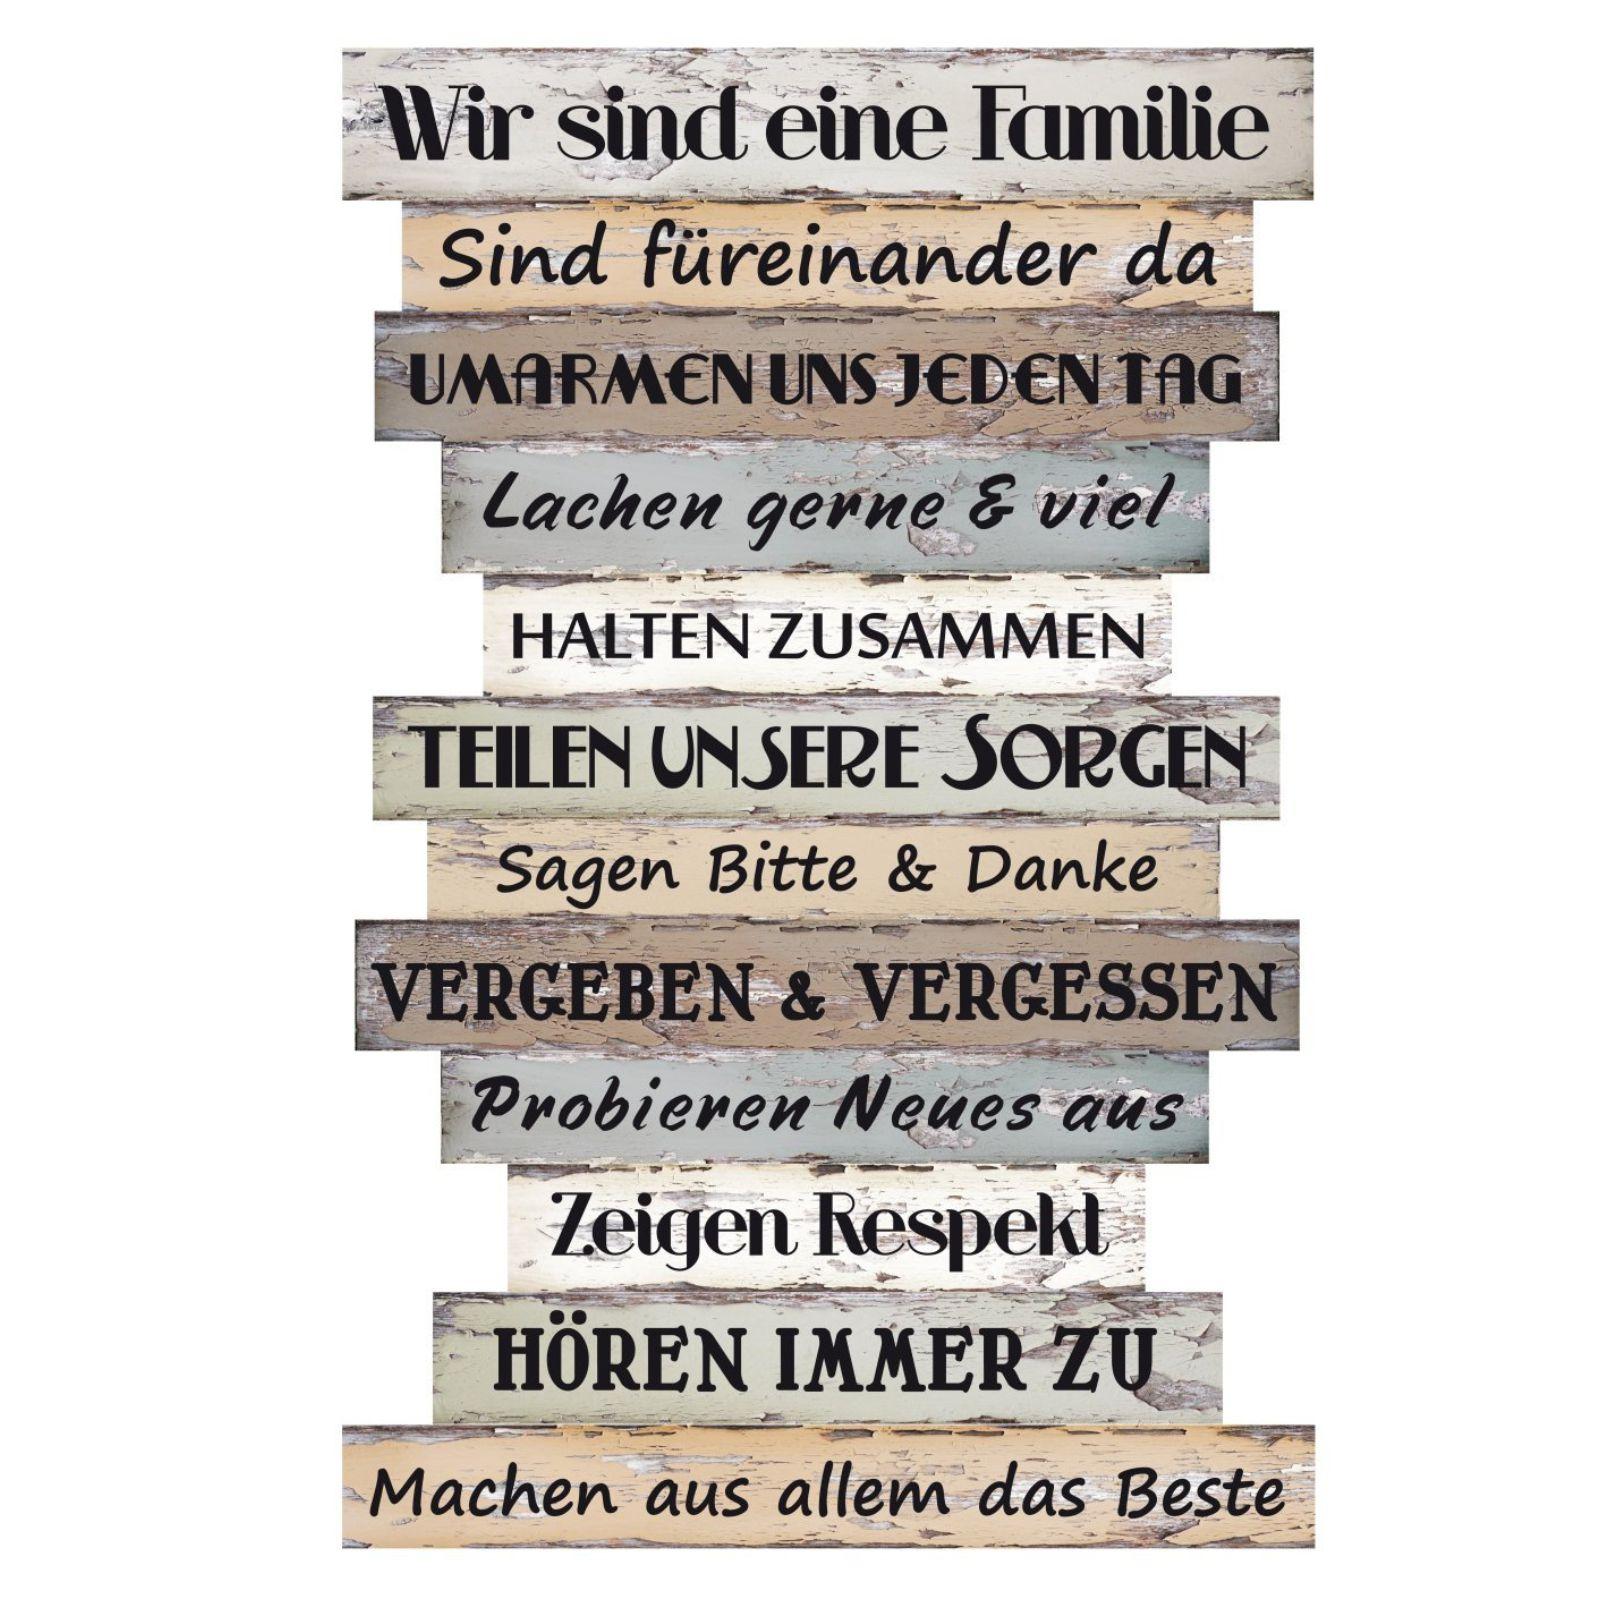 DAVIDE24 | Holztafel, Wandbild, Spruch